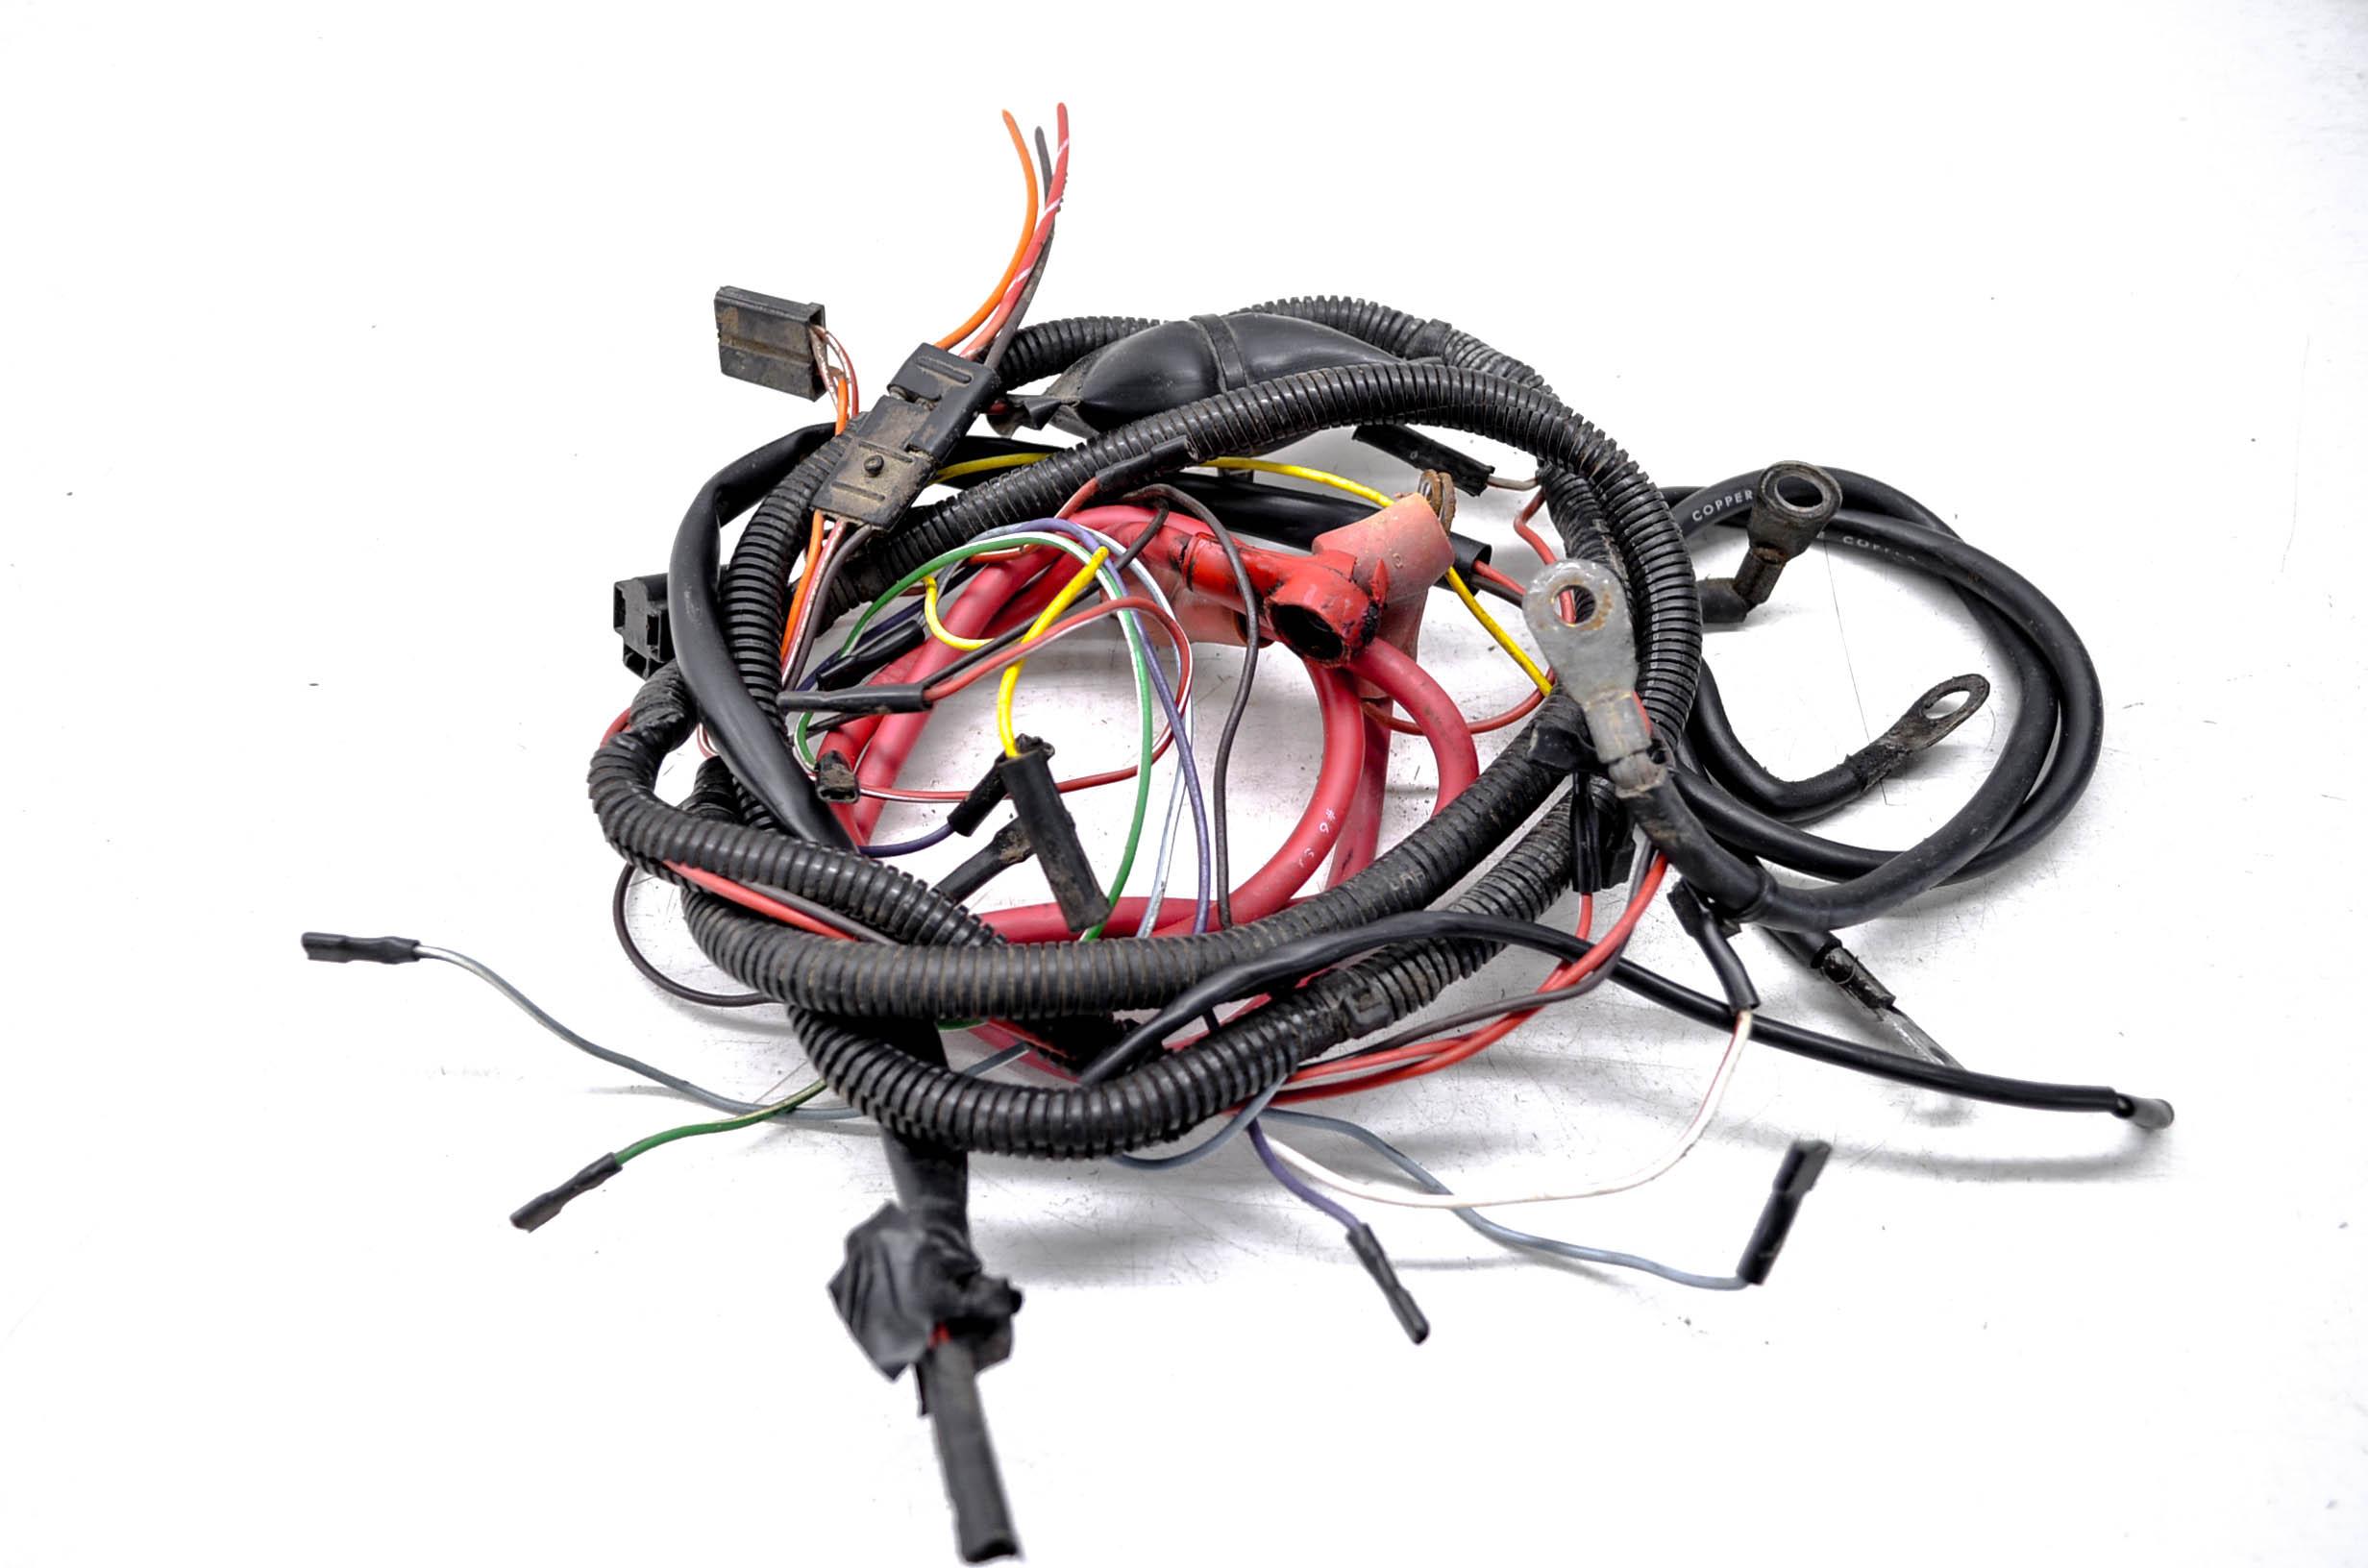 95 Polaris Xplorer 400 4x4 Wire Harness Electrical Wiring